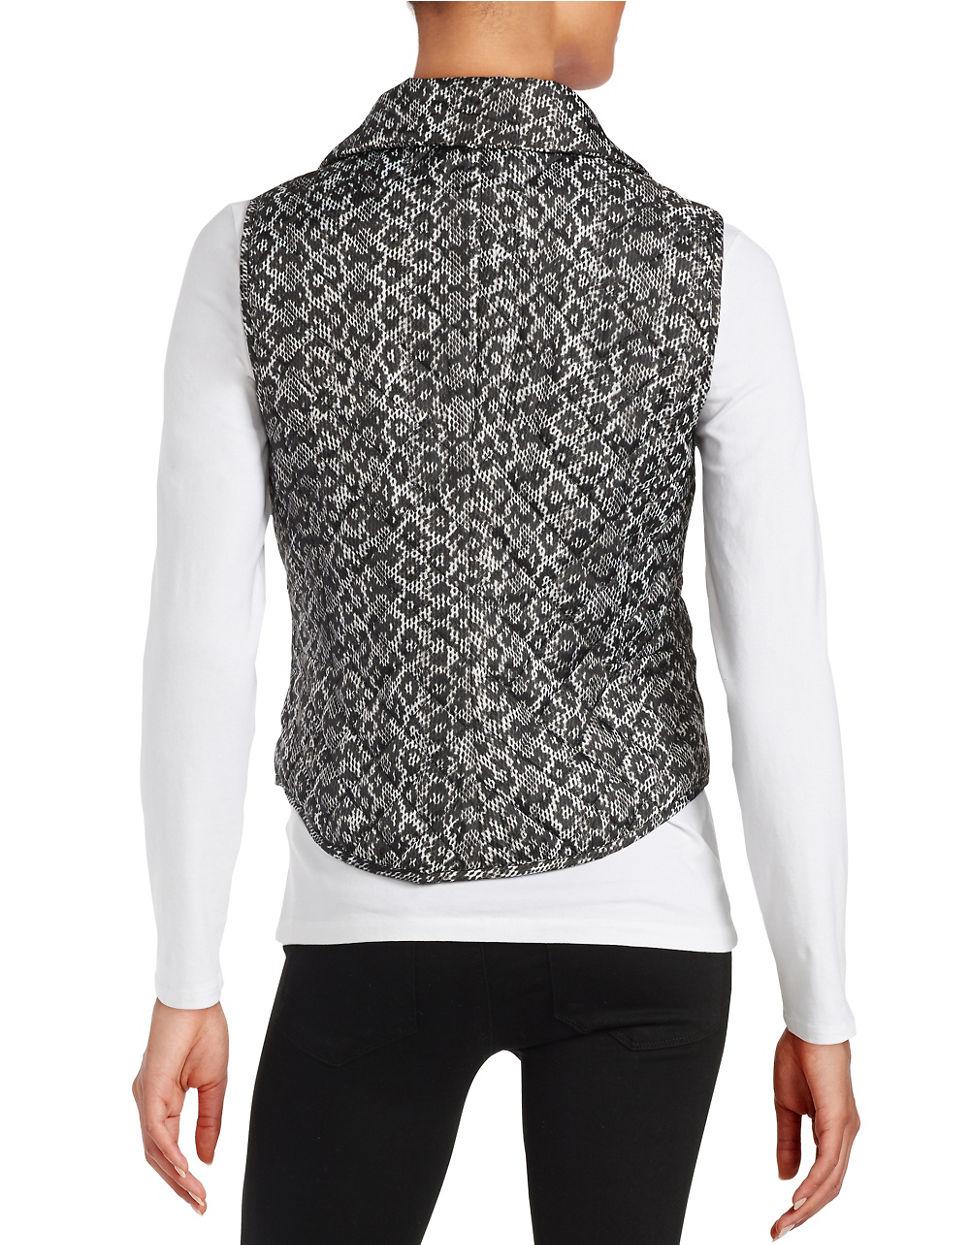 Michael michael kors Petite Quilted Zip-front Vest in Black | Lyst : quilted zip front vest - Adamdwight.com